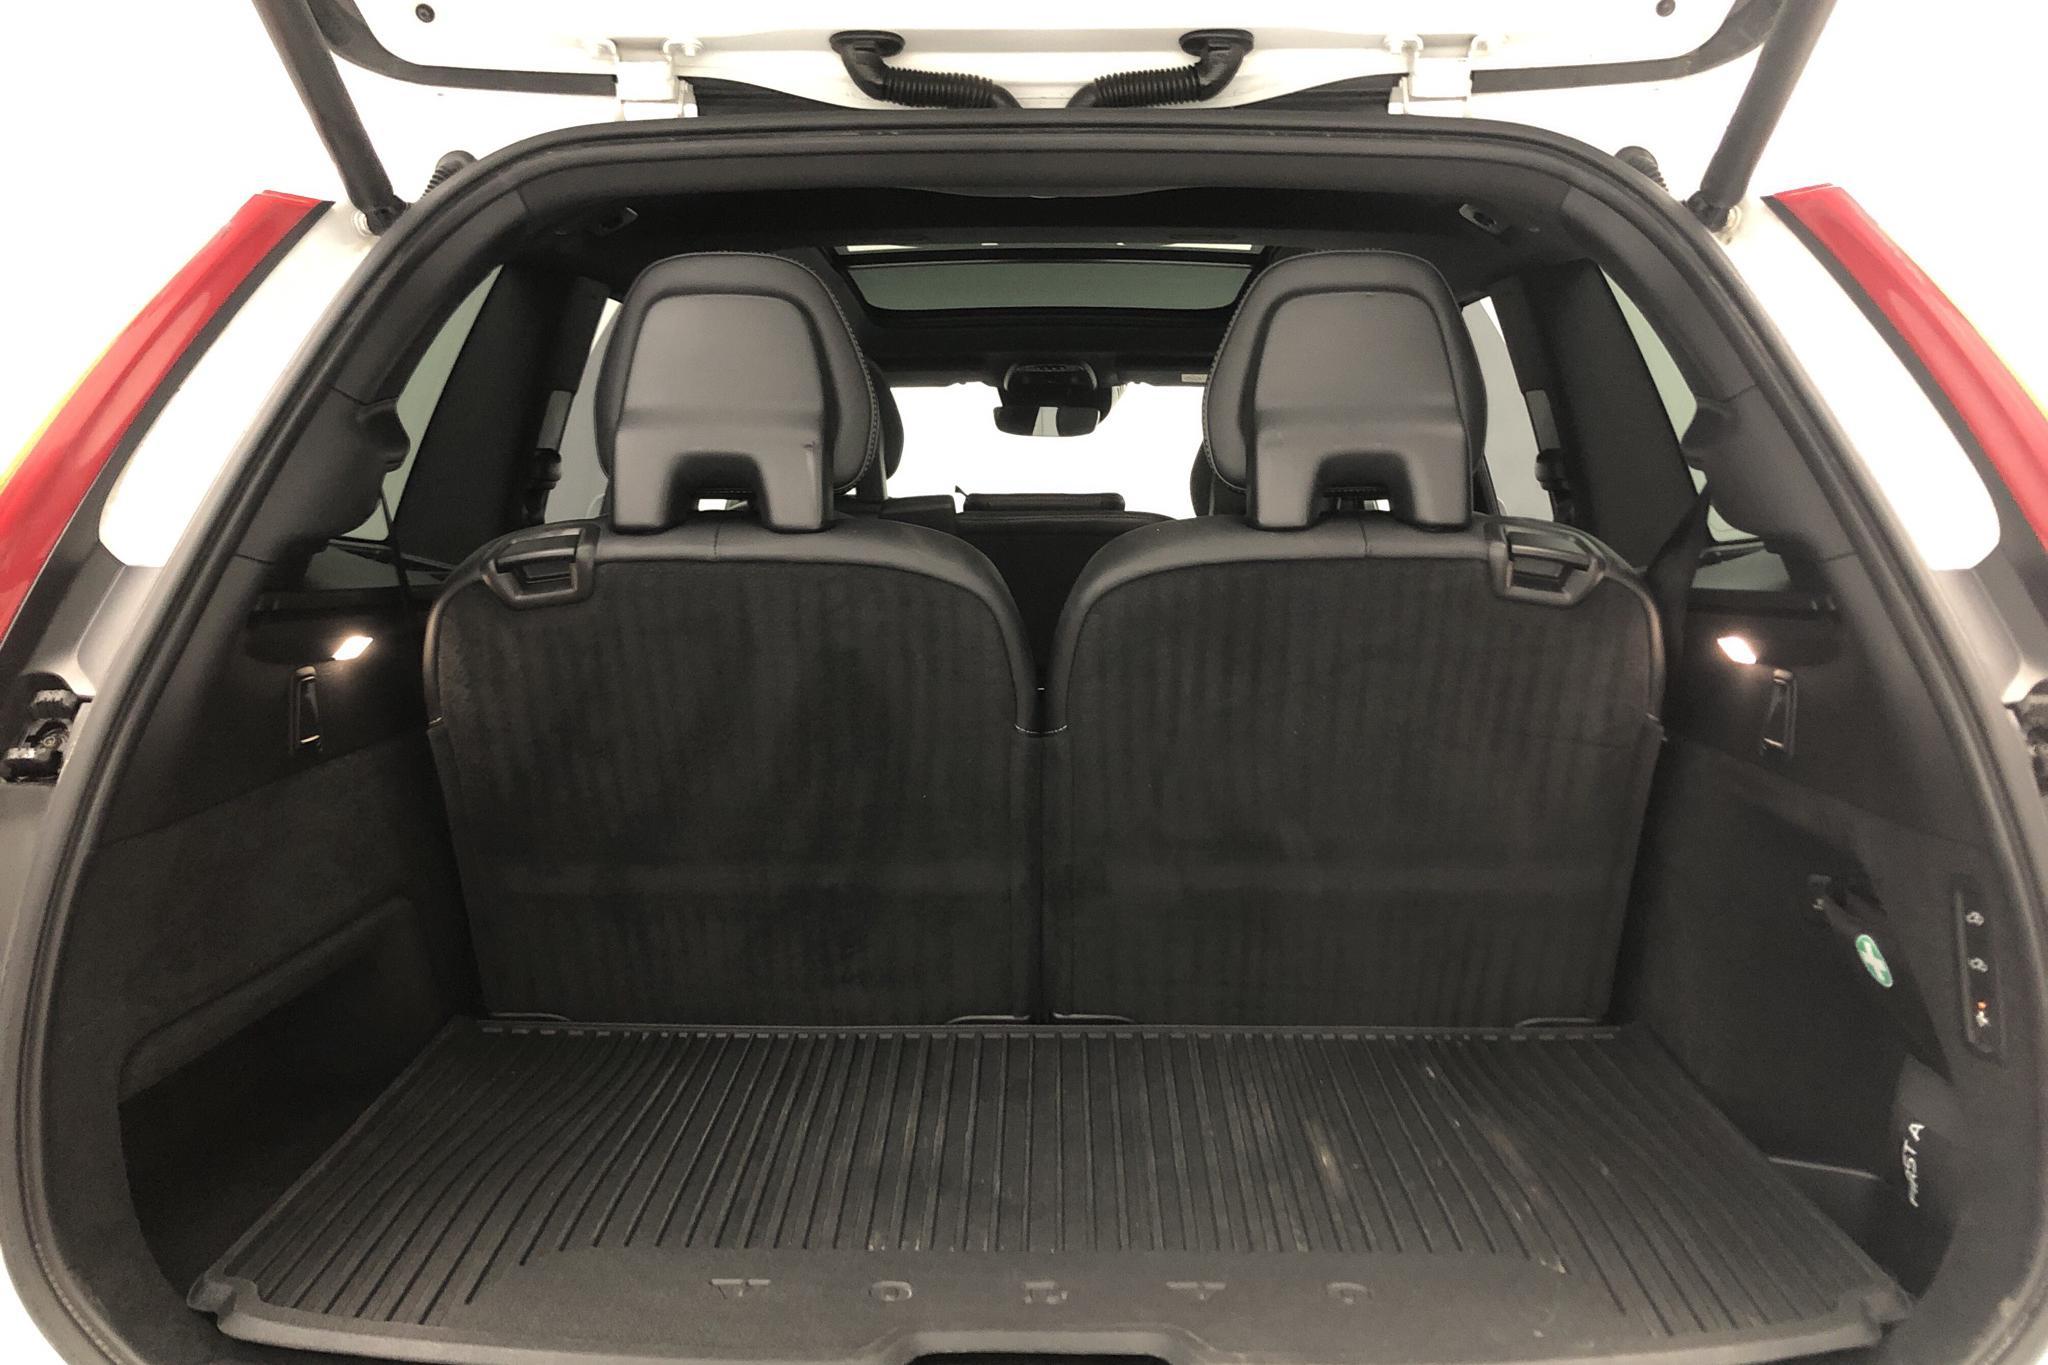 Volvo XC90 D5 AWD (235hk) - 128 570 km - Automatic - white - 2018